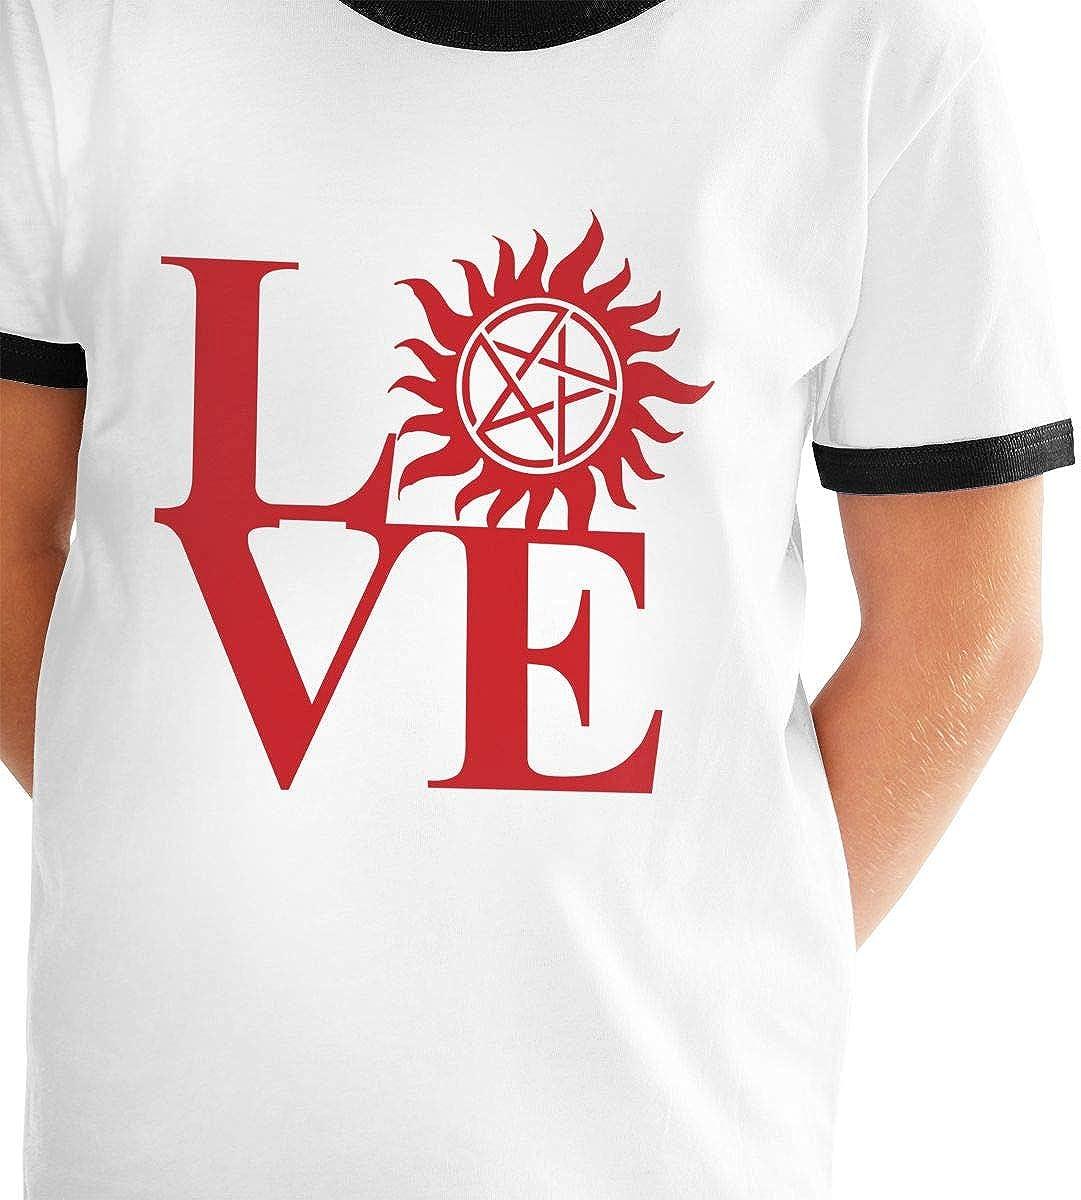 Youth Graphic Boys Girls Love Supernatural Red Logo Teens Short Sleeve T Shirt Tees Shirts Tops Sport